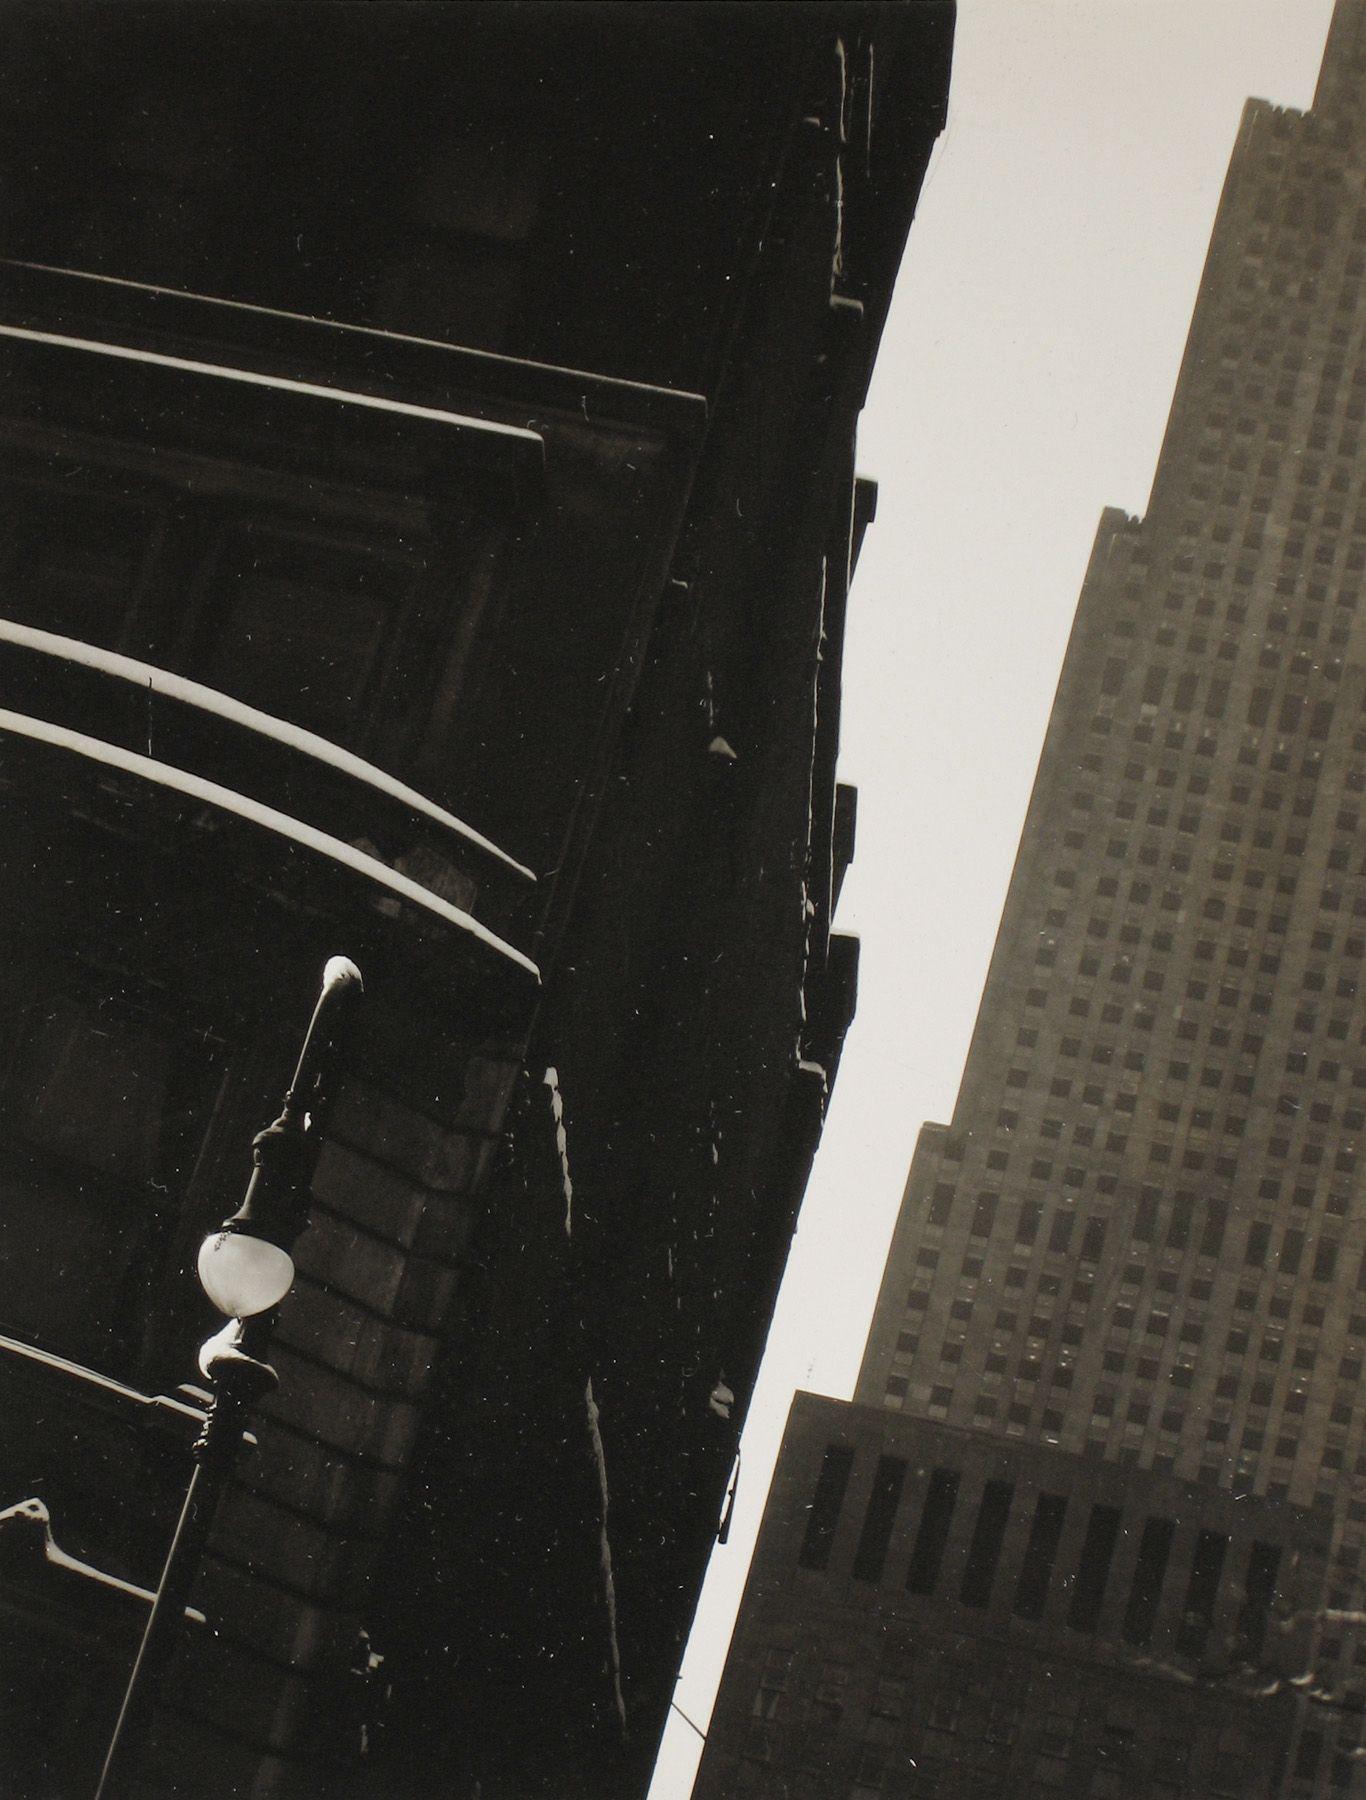 Minor White - West 53rd Street, New York City, 1946 - Howard Greenberg Gallery